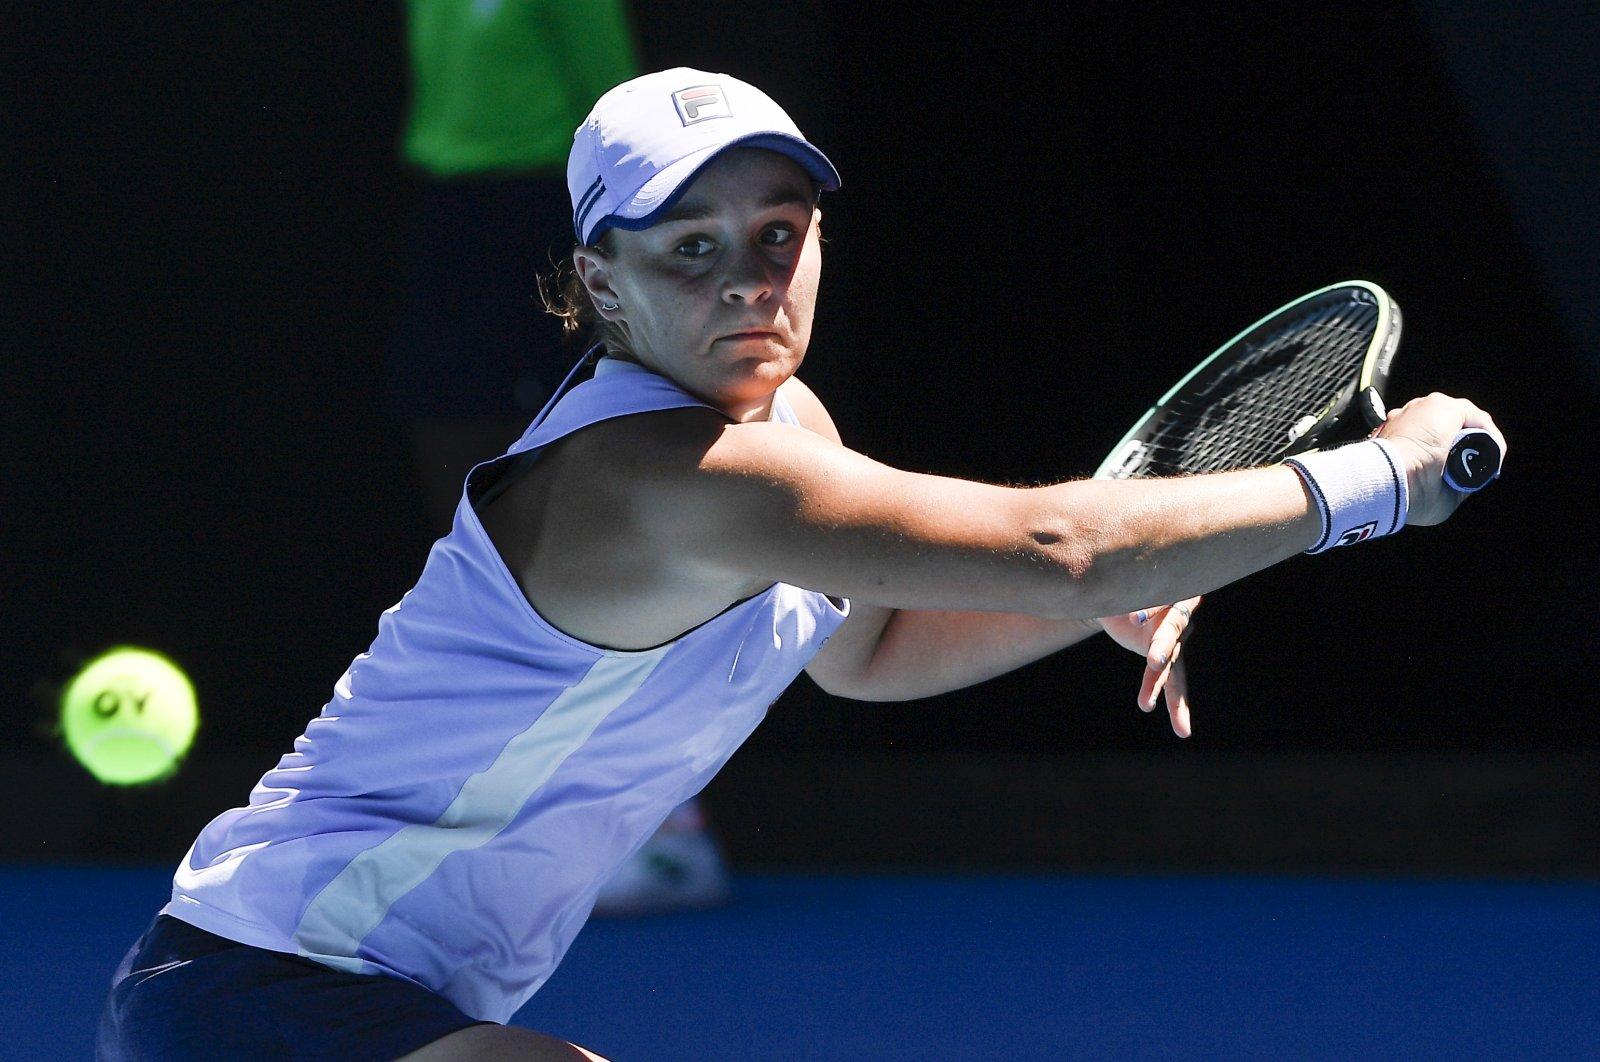 Ash Barty hits a backhand return during a quarterfinal match against Karolina Muchova at the Australian Open tennis championship in Melbourne, Australia, Feb. 17, 2021. (AP Photo)